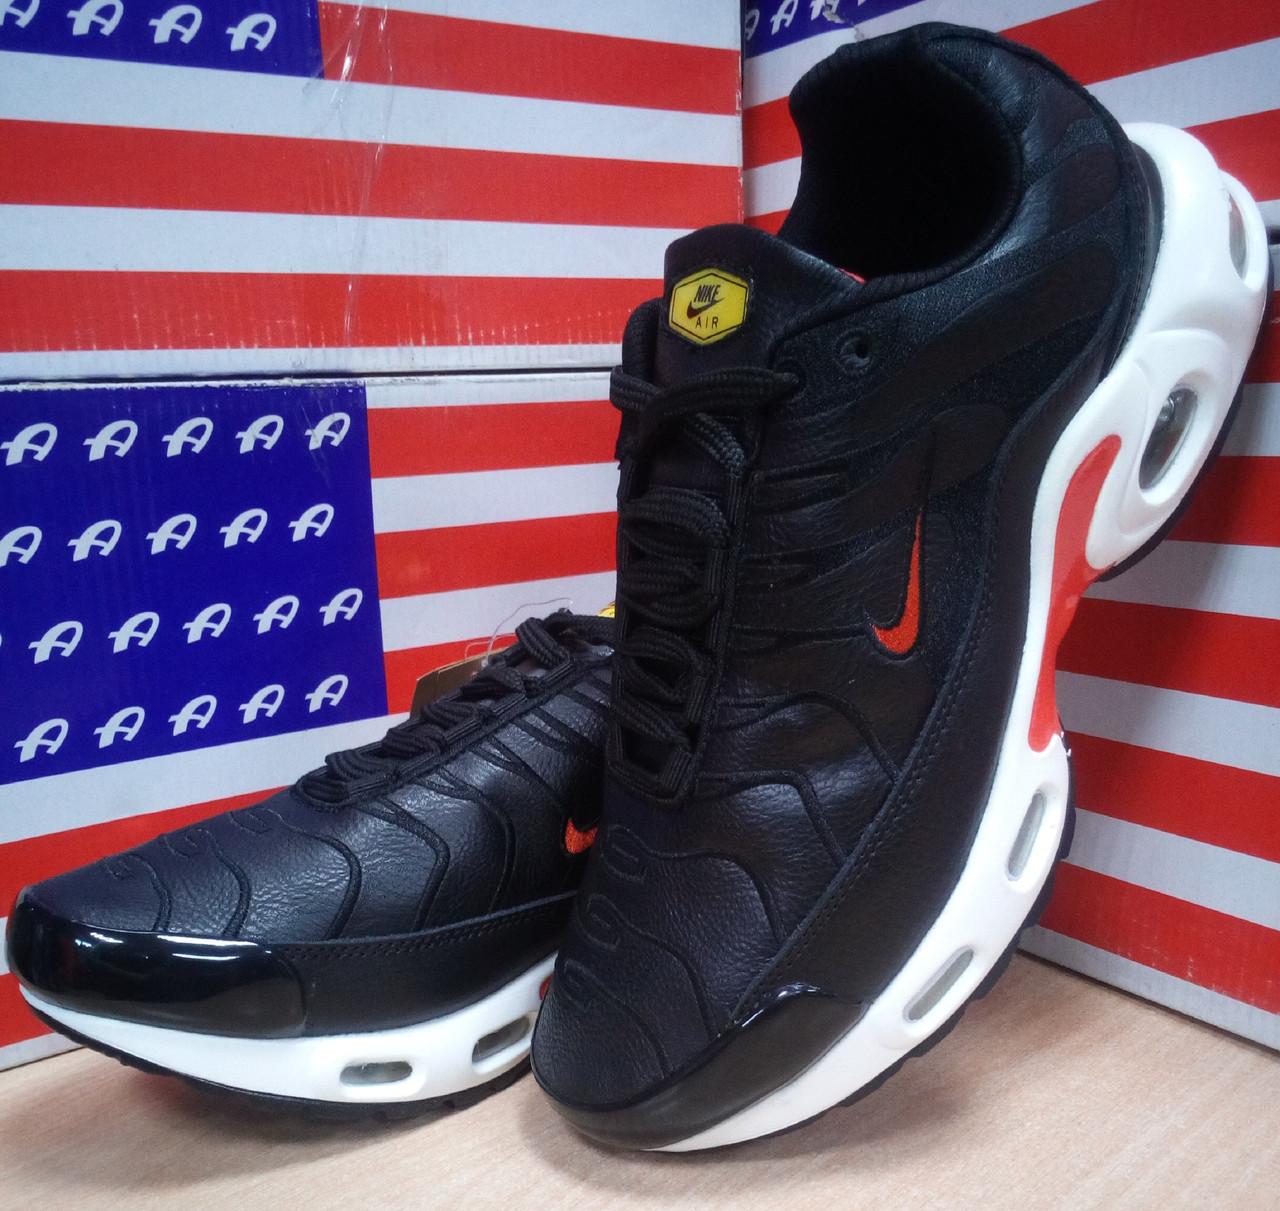 c44a8c56 Мужские кроссовки Найк Аир Макс Тн Плюс/Nike Air Max Tn Plus ...